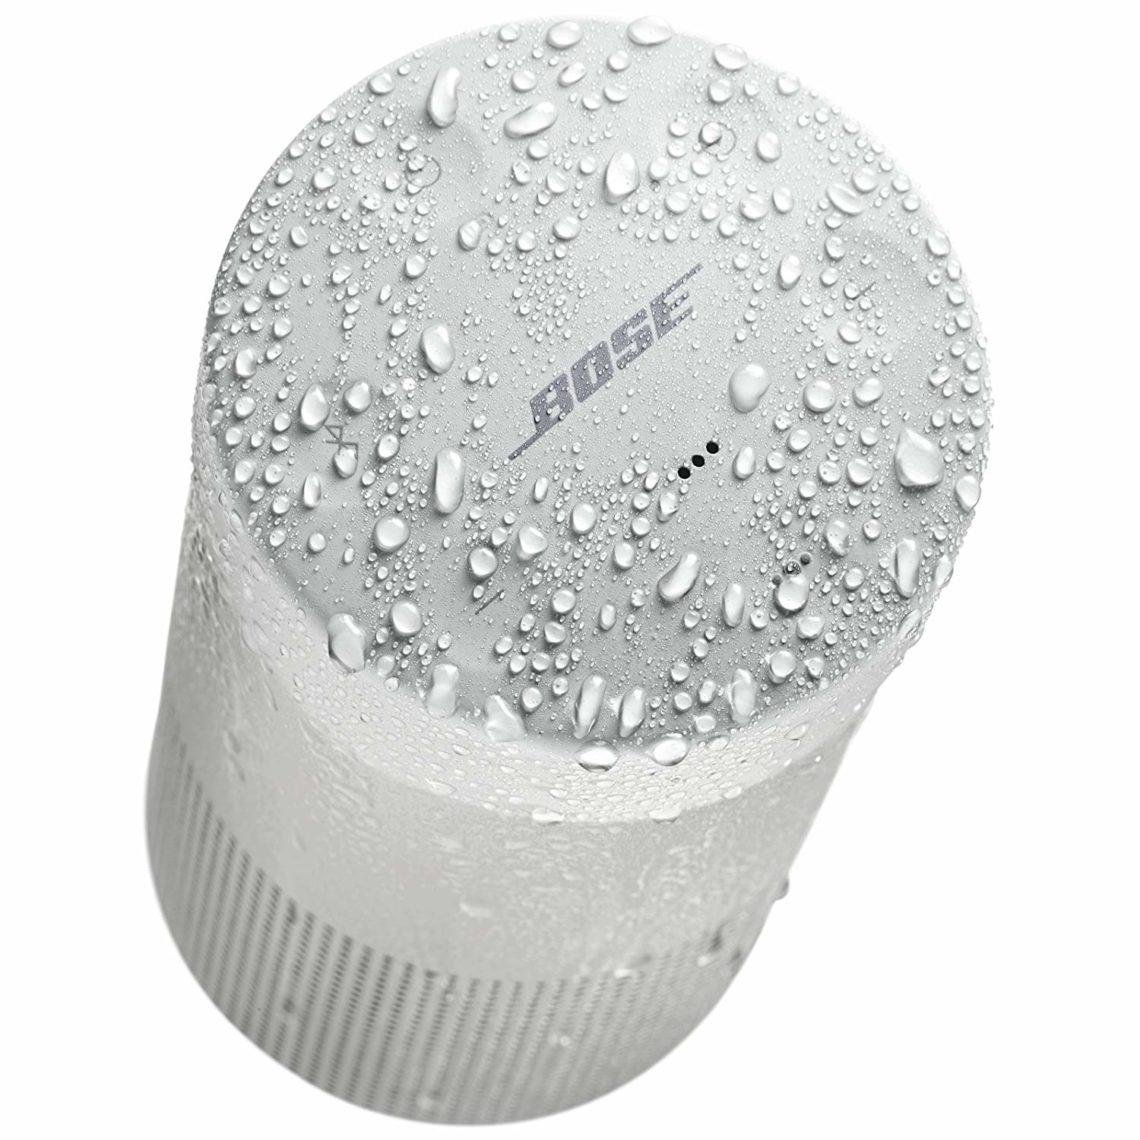 Bose SoundLink Revolve Enceinte Haut-parleur Bluetooth waterproof